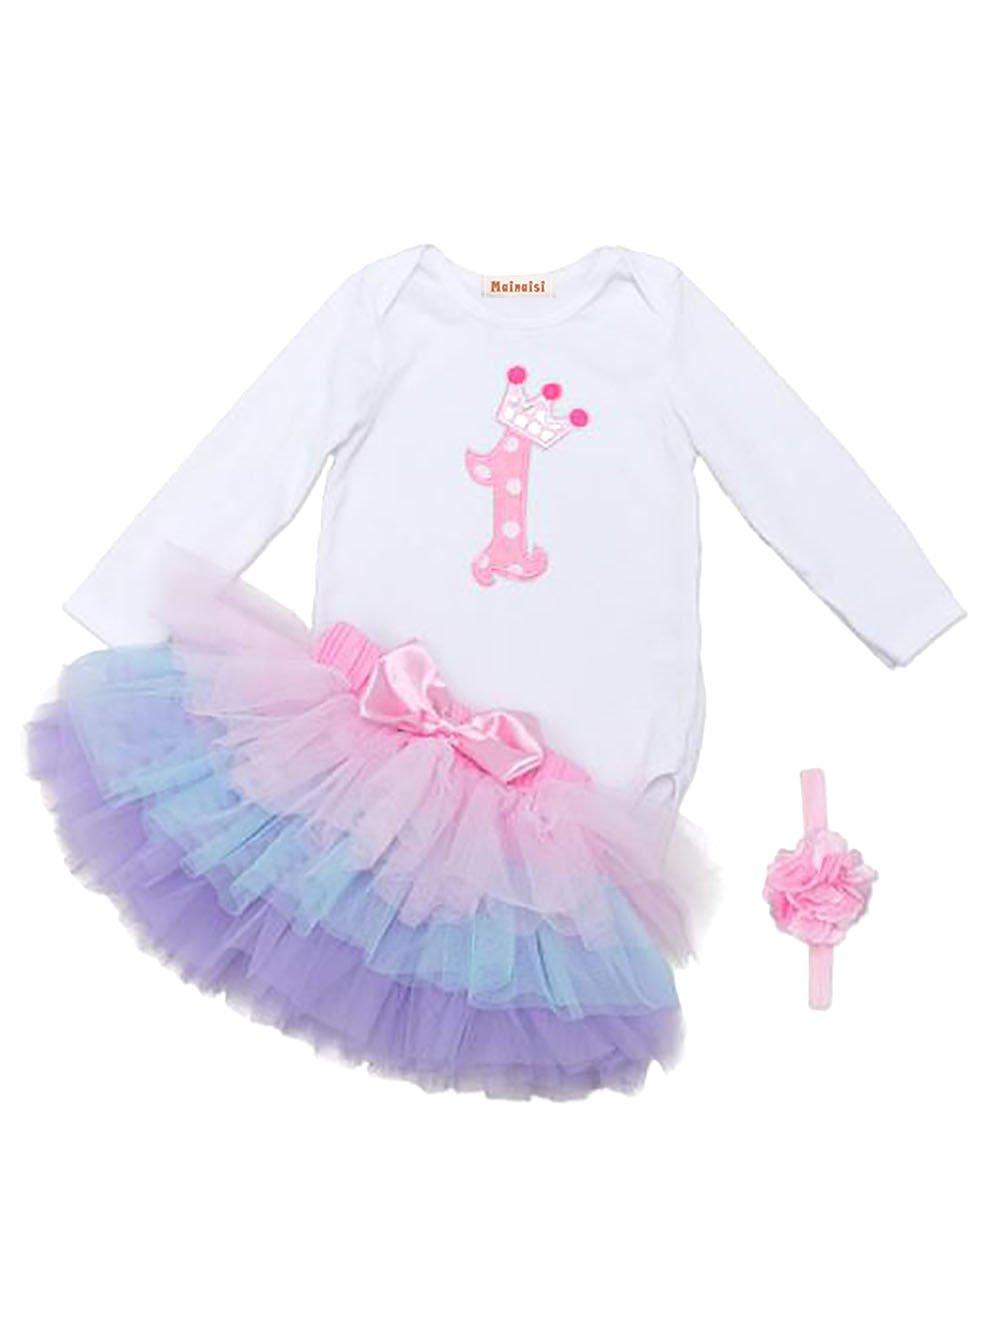 Mainaisi Bambina 3pcs 1st Birthday tutù + fascia + romper imposta Body, 9-24 mesi Mainaisi Network technology Ltd